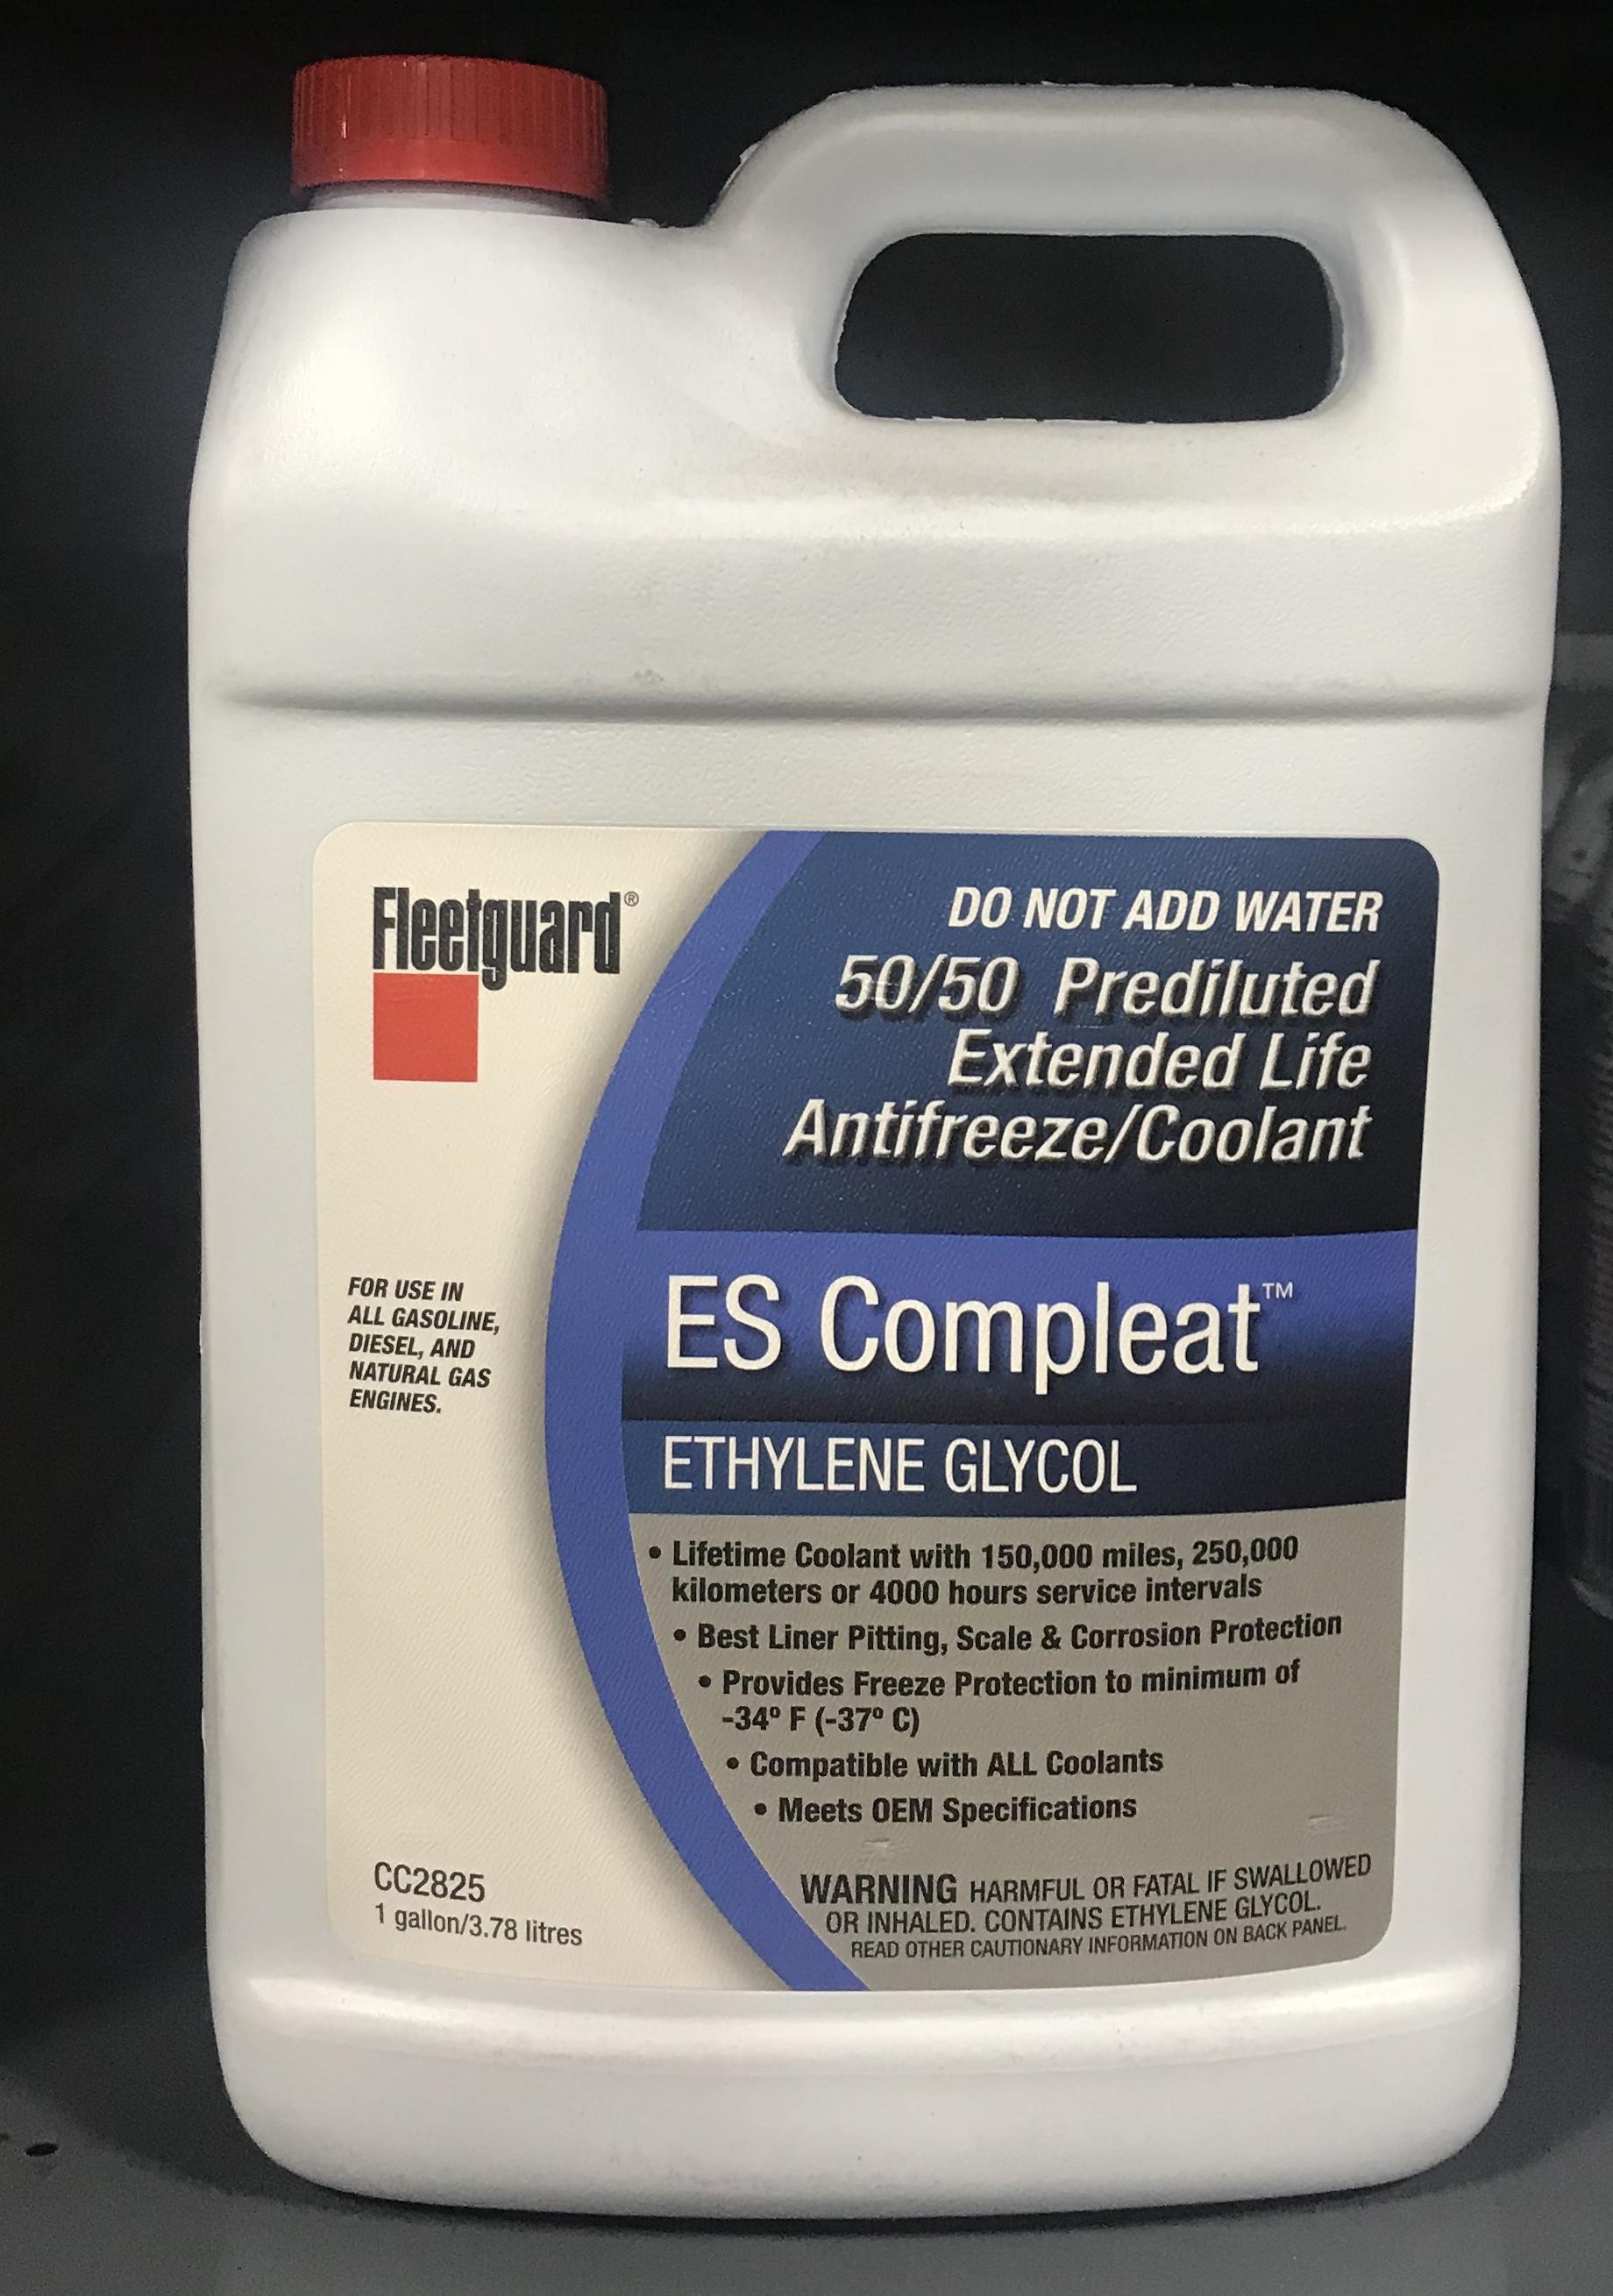 CC2825 - Fleetguard ES Compleat EG 50/50 Coolant